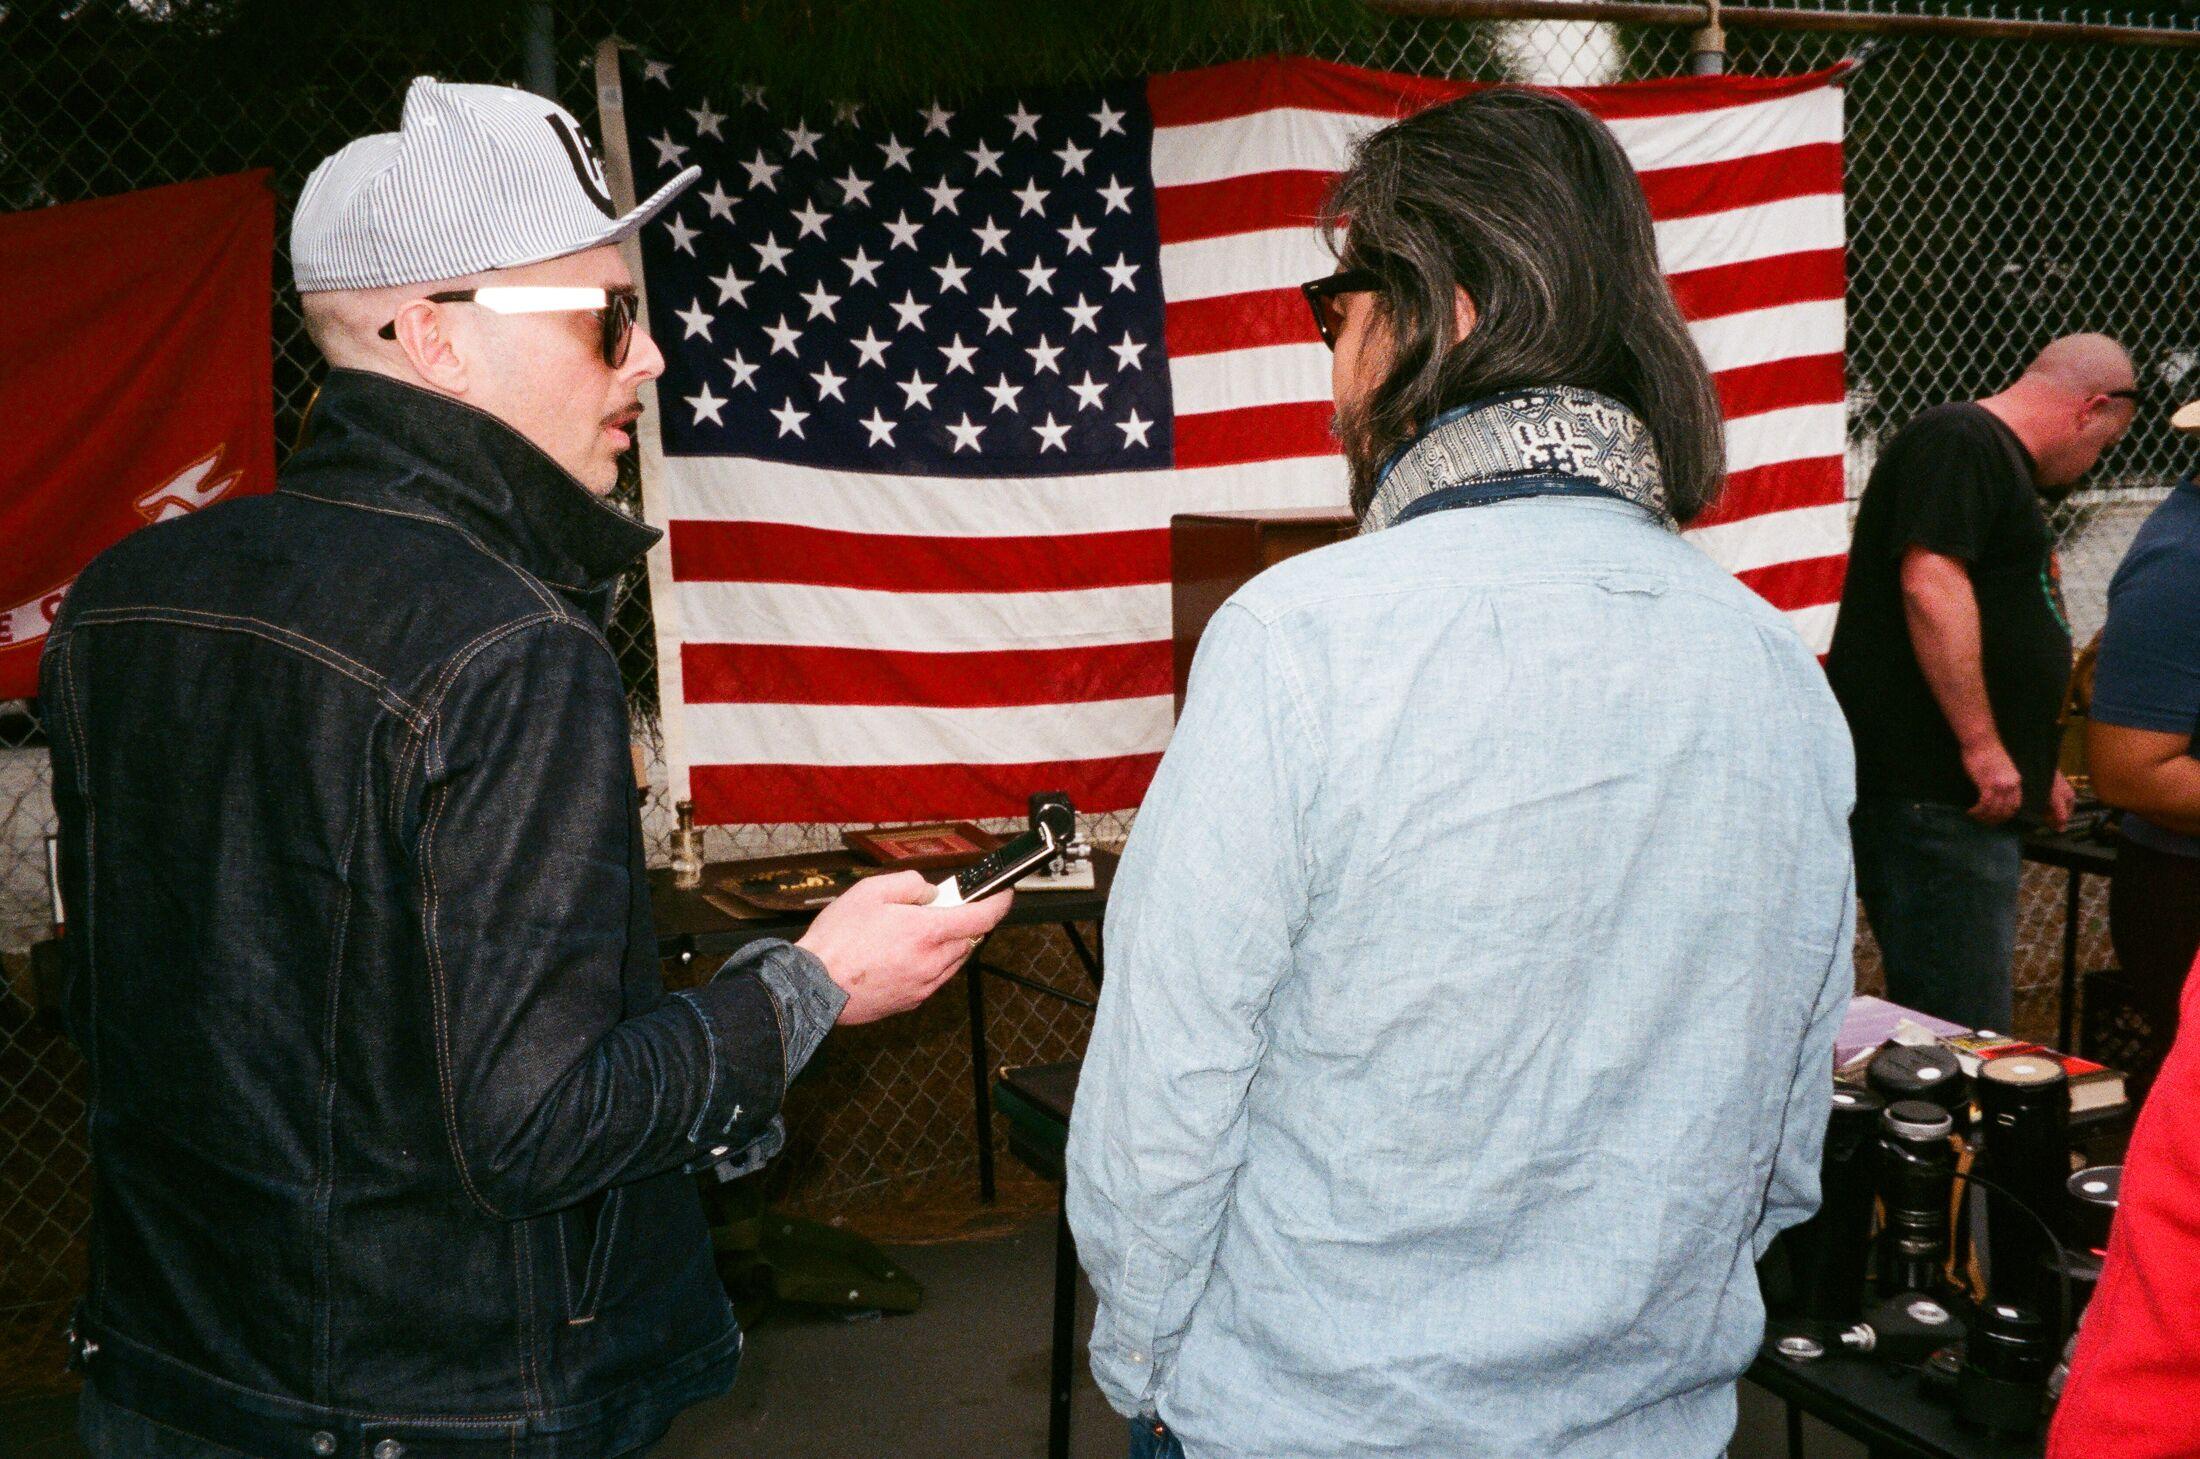 Joe Jarvis on the left interviewing Yuki Matsuda.